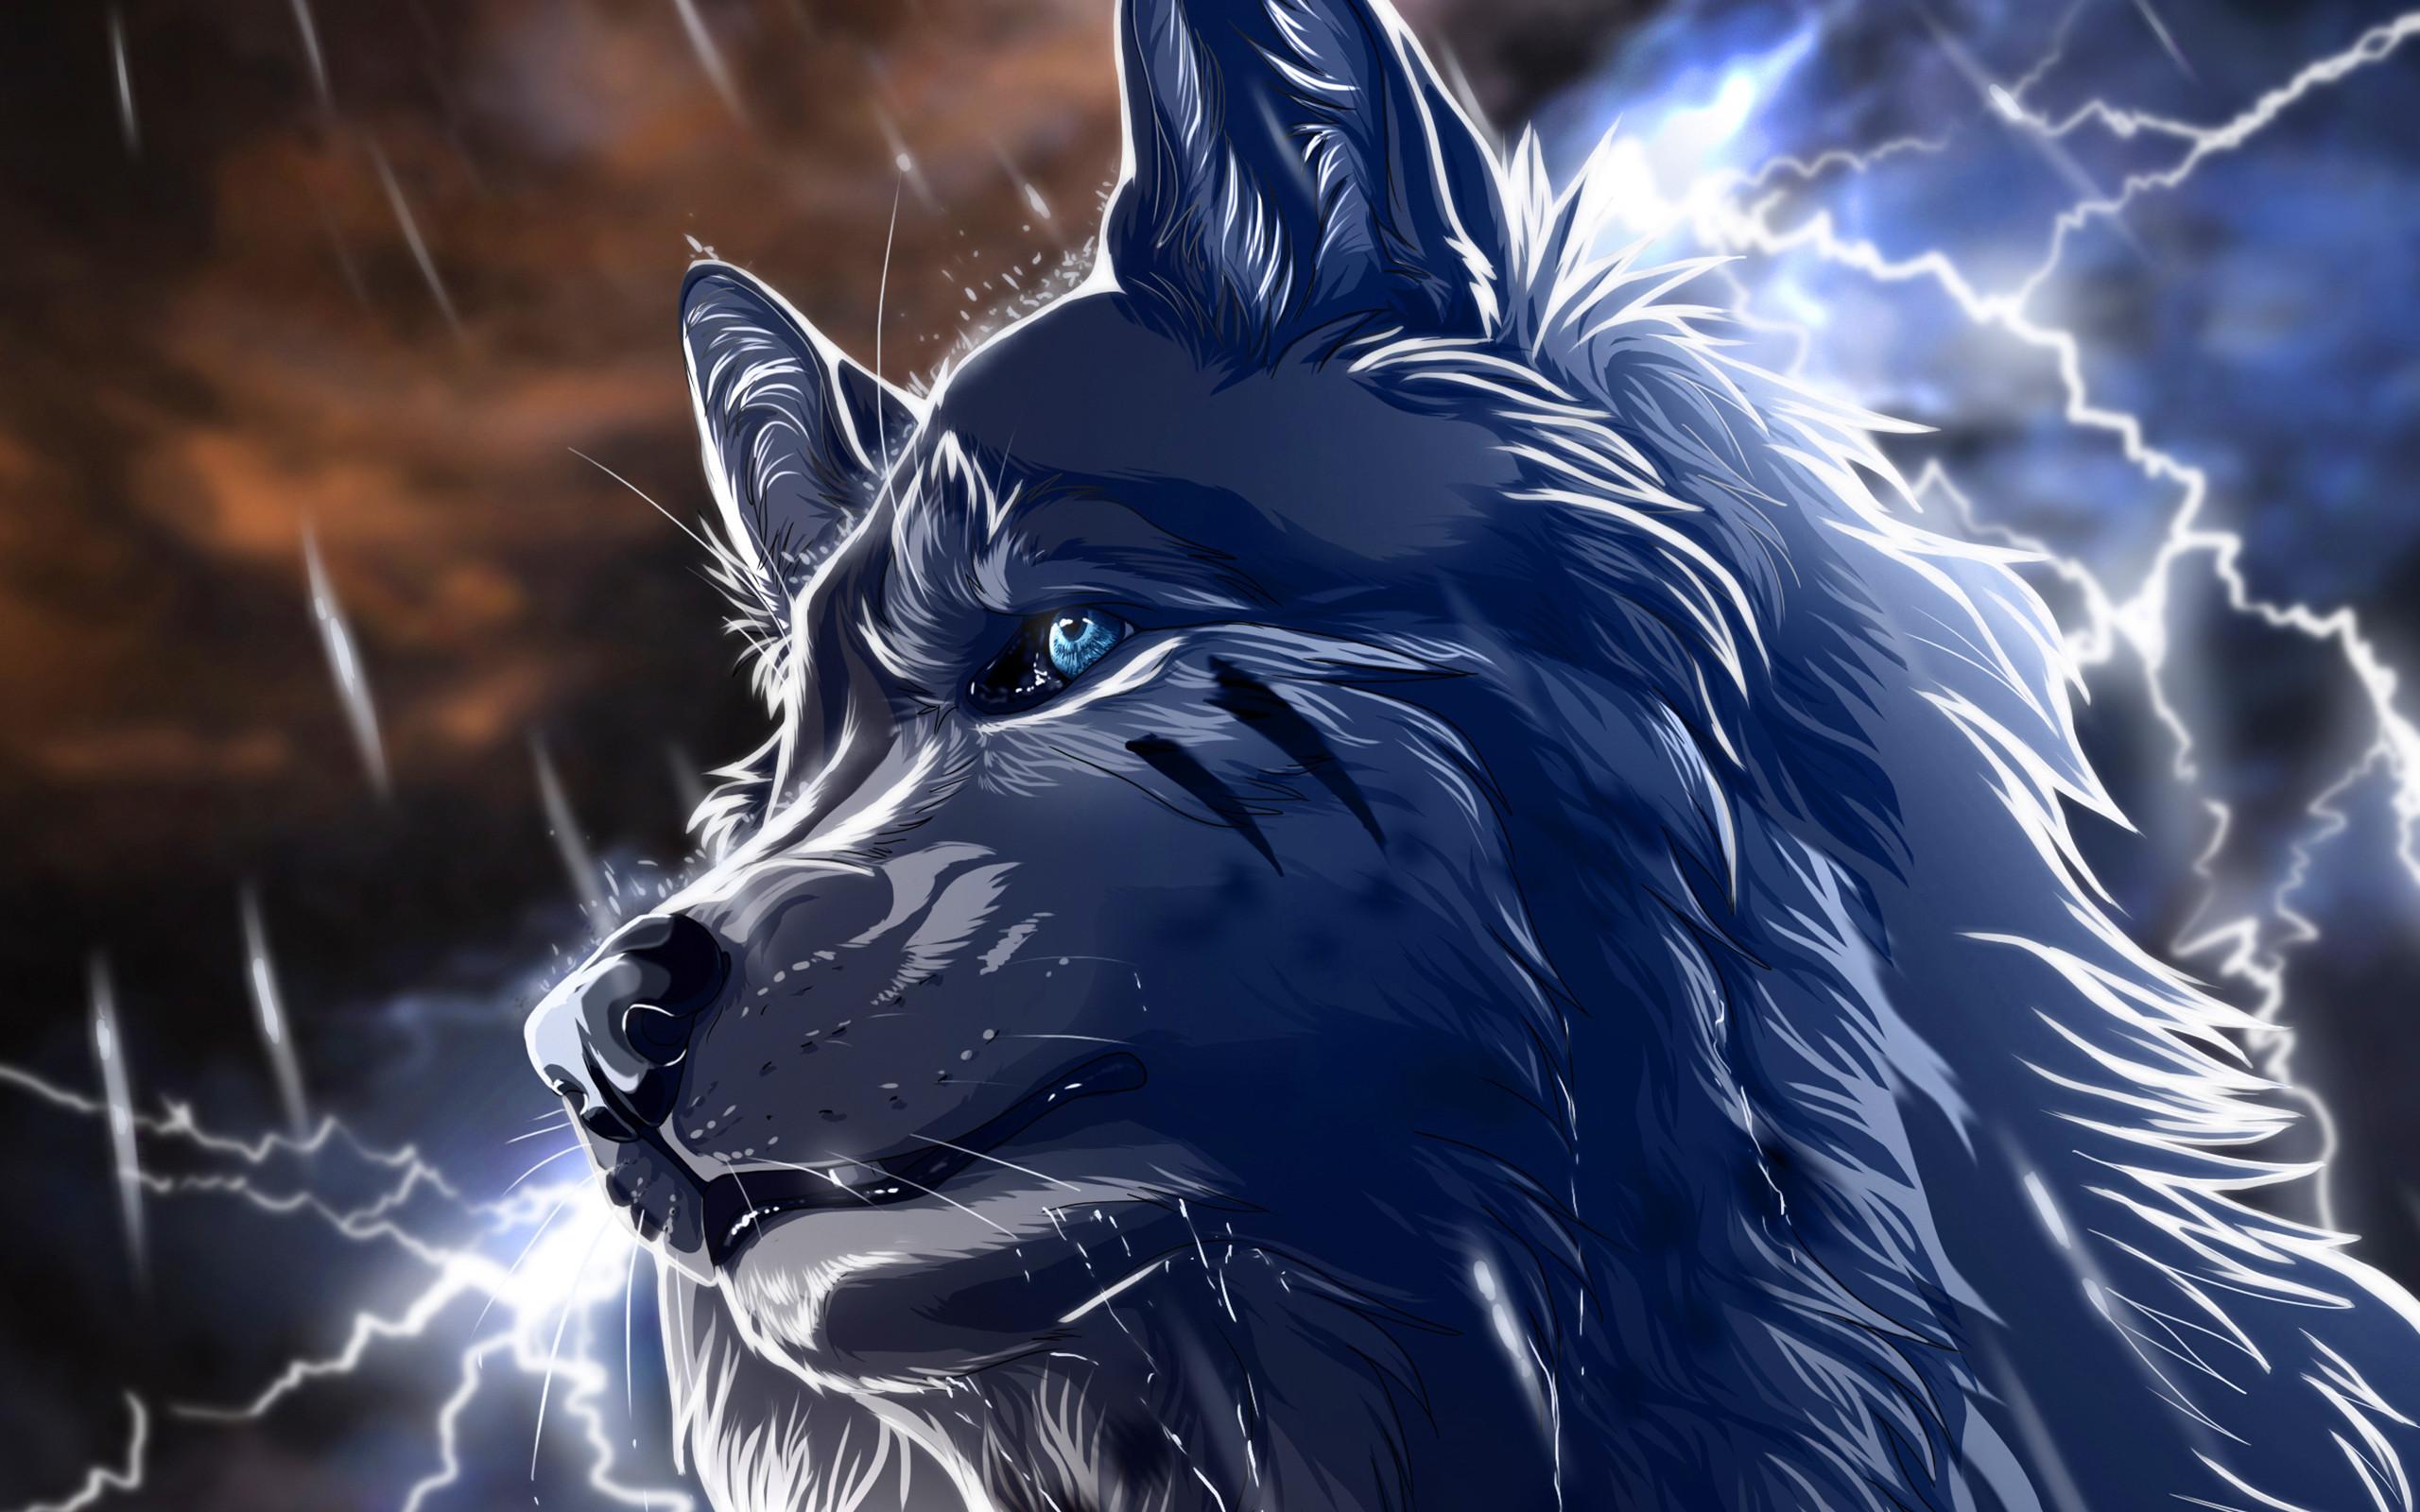 Werewolf wallpaper hd – photo#25